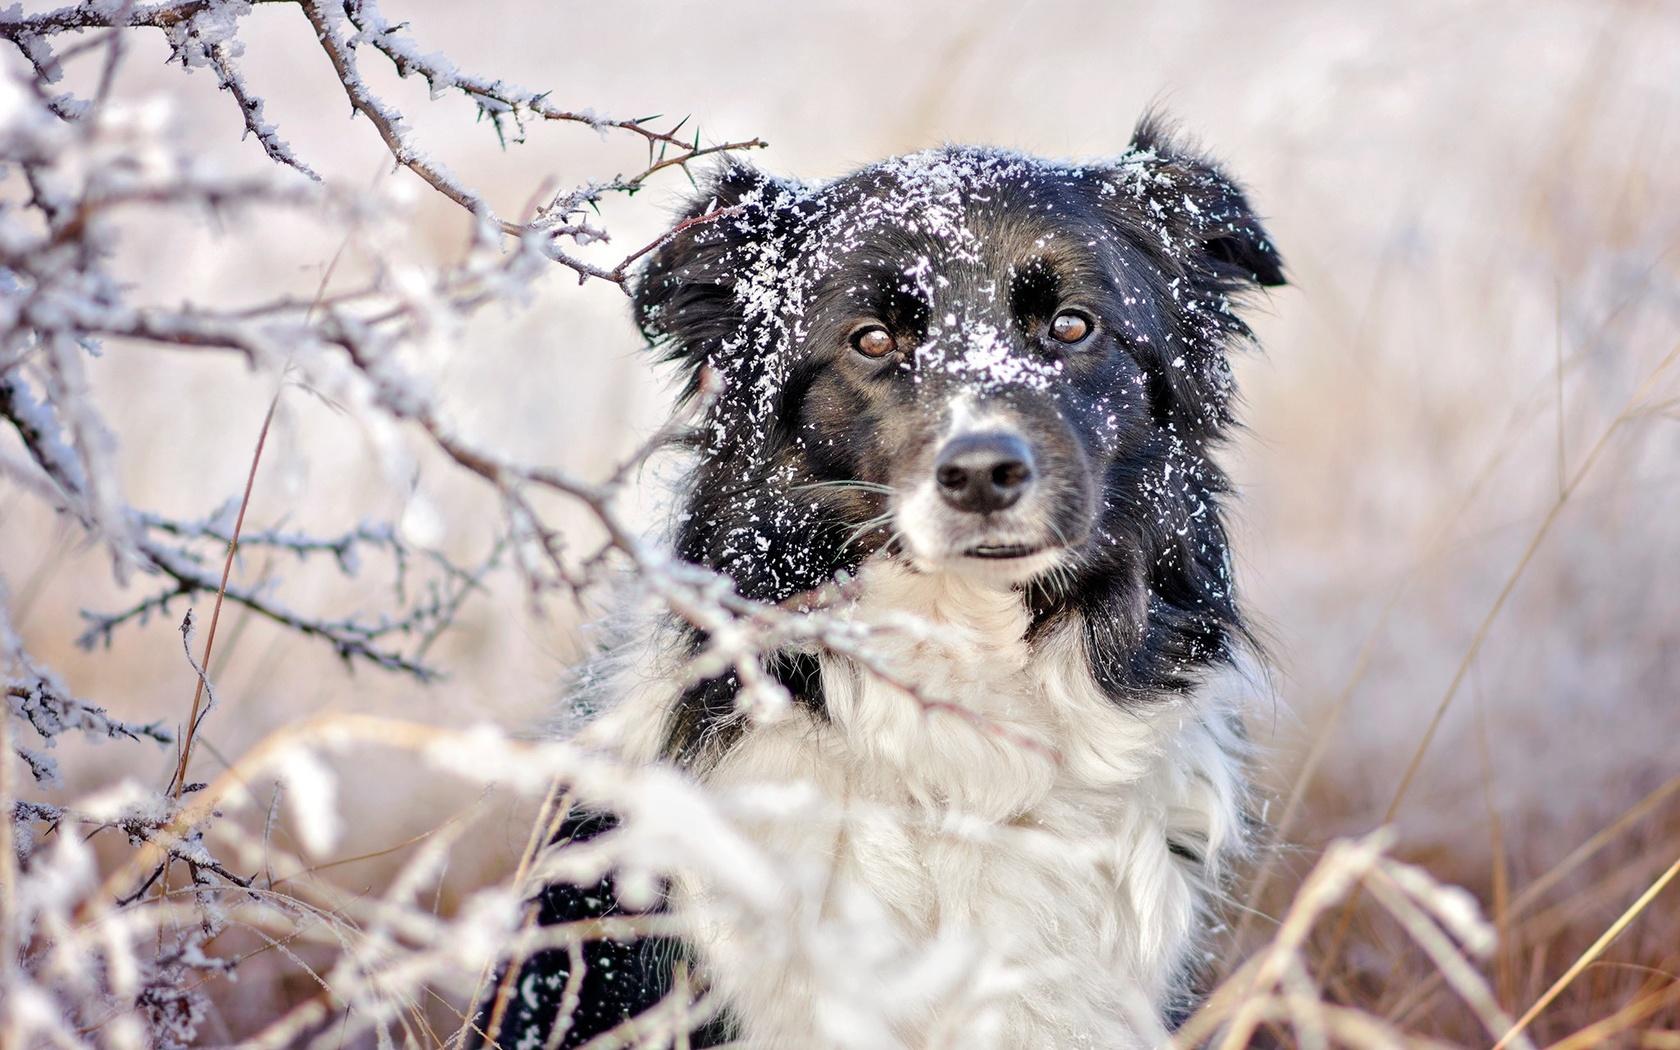 животное, собака, пёс, бордер-колли, природа, зима, снег, ветки